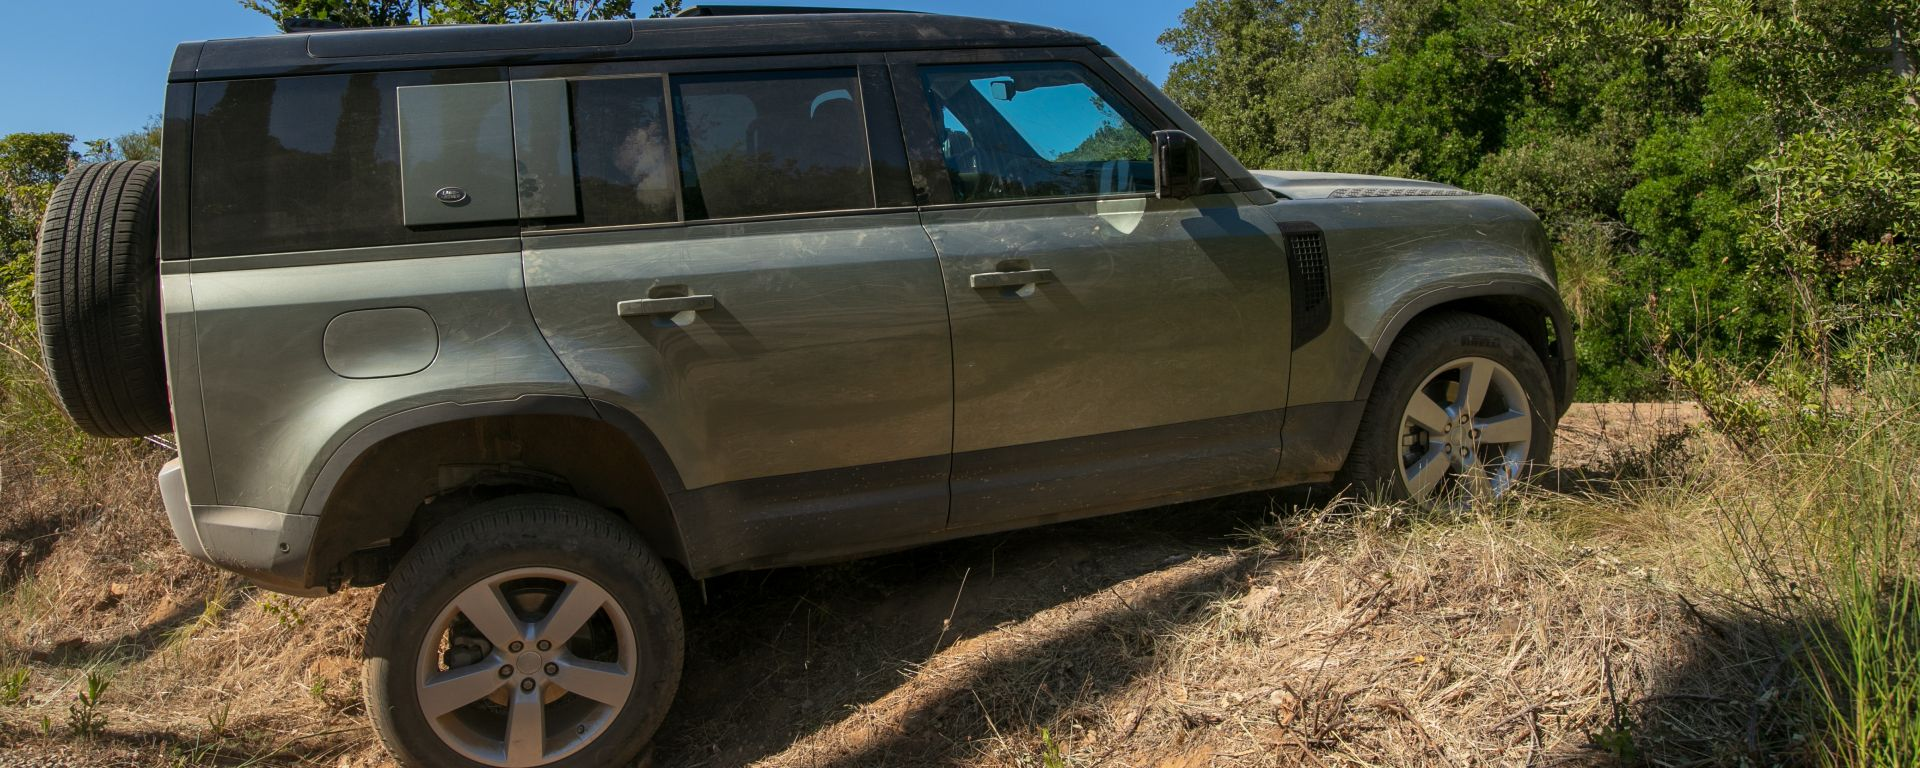 Land Rover Defender 110 in off-road